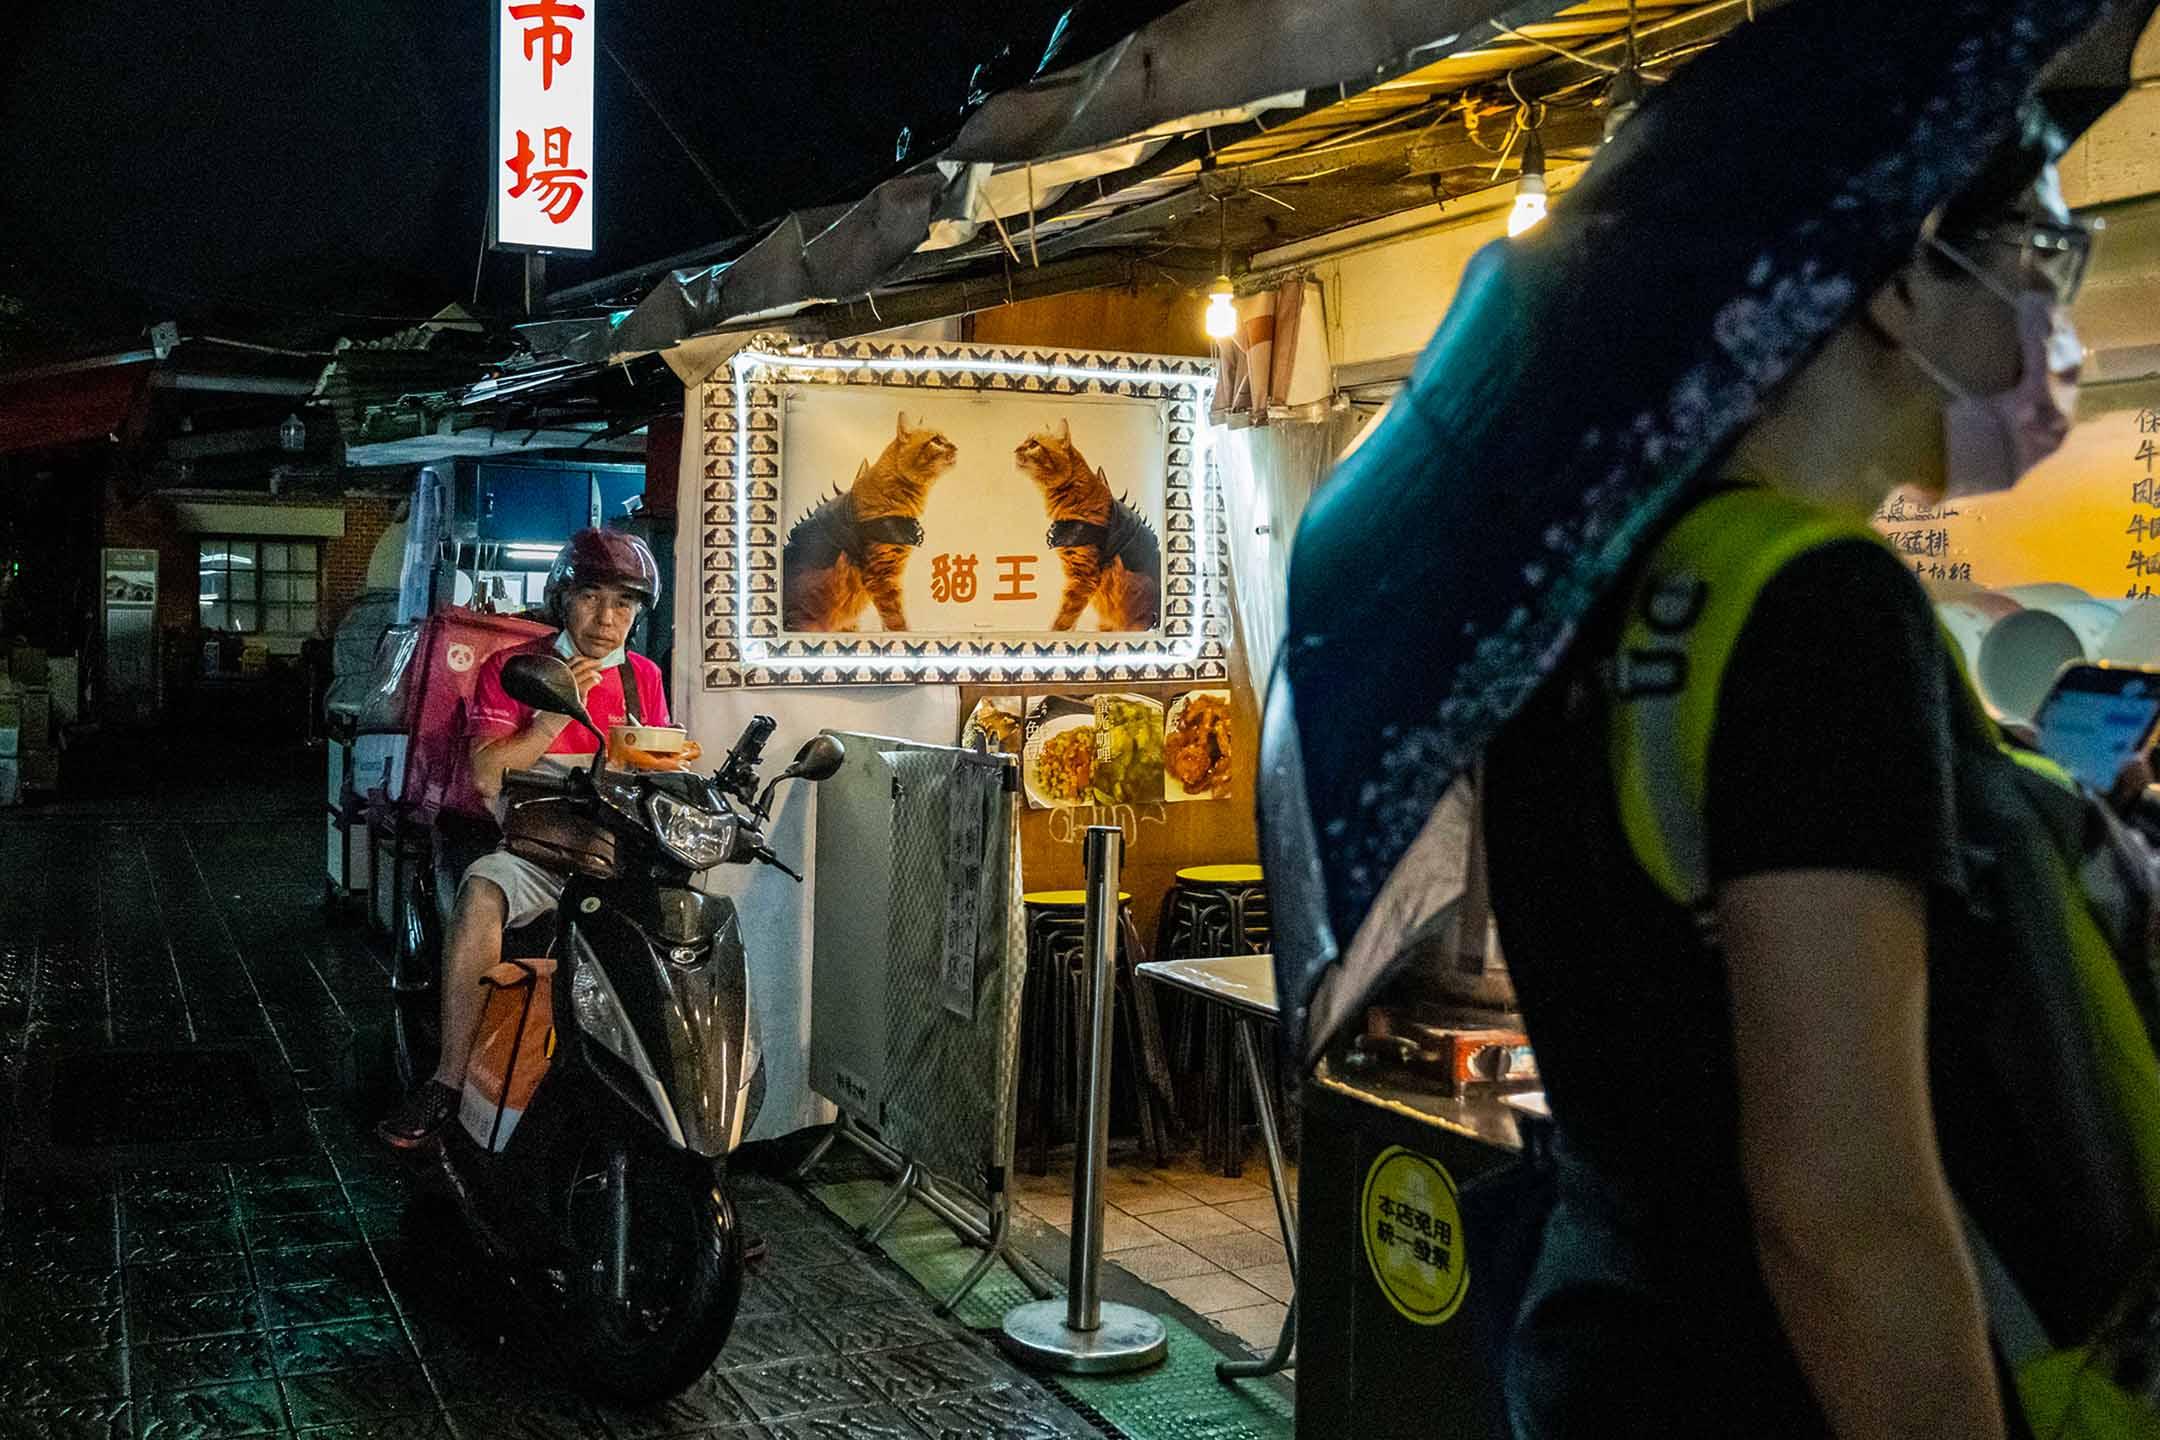 2021年6月3日台灣台北,一名外送員在一家餐廳外。 攝:Billy H.C. Kwok/Bloomberg via Getty Images